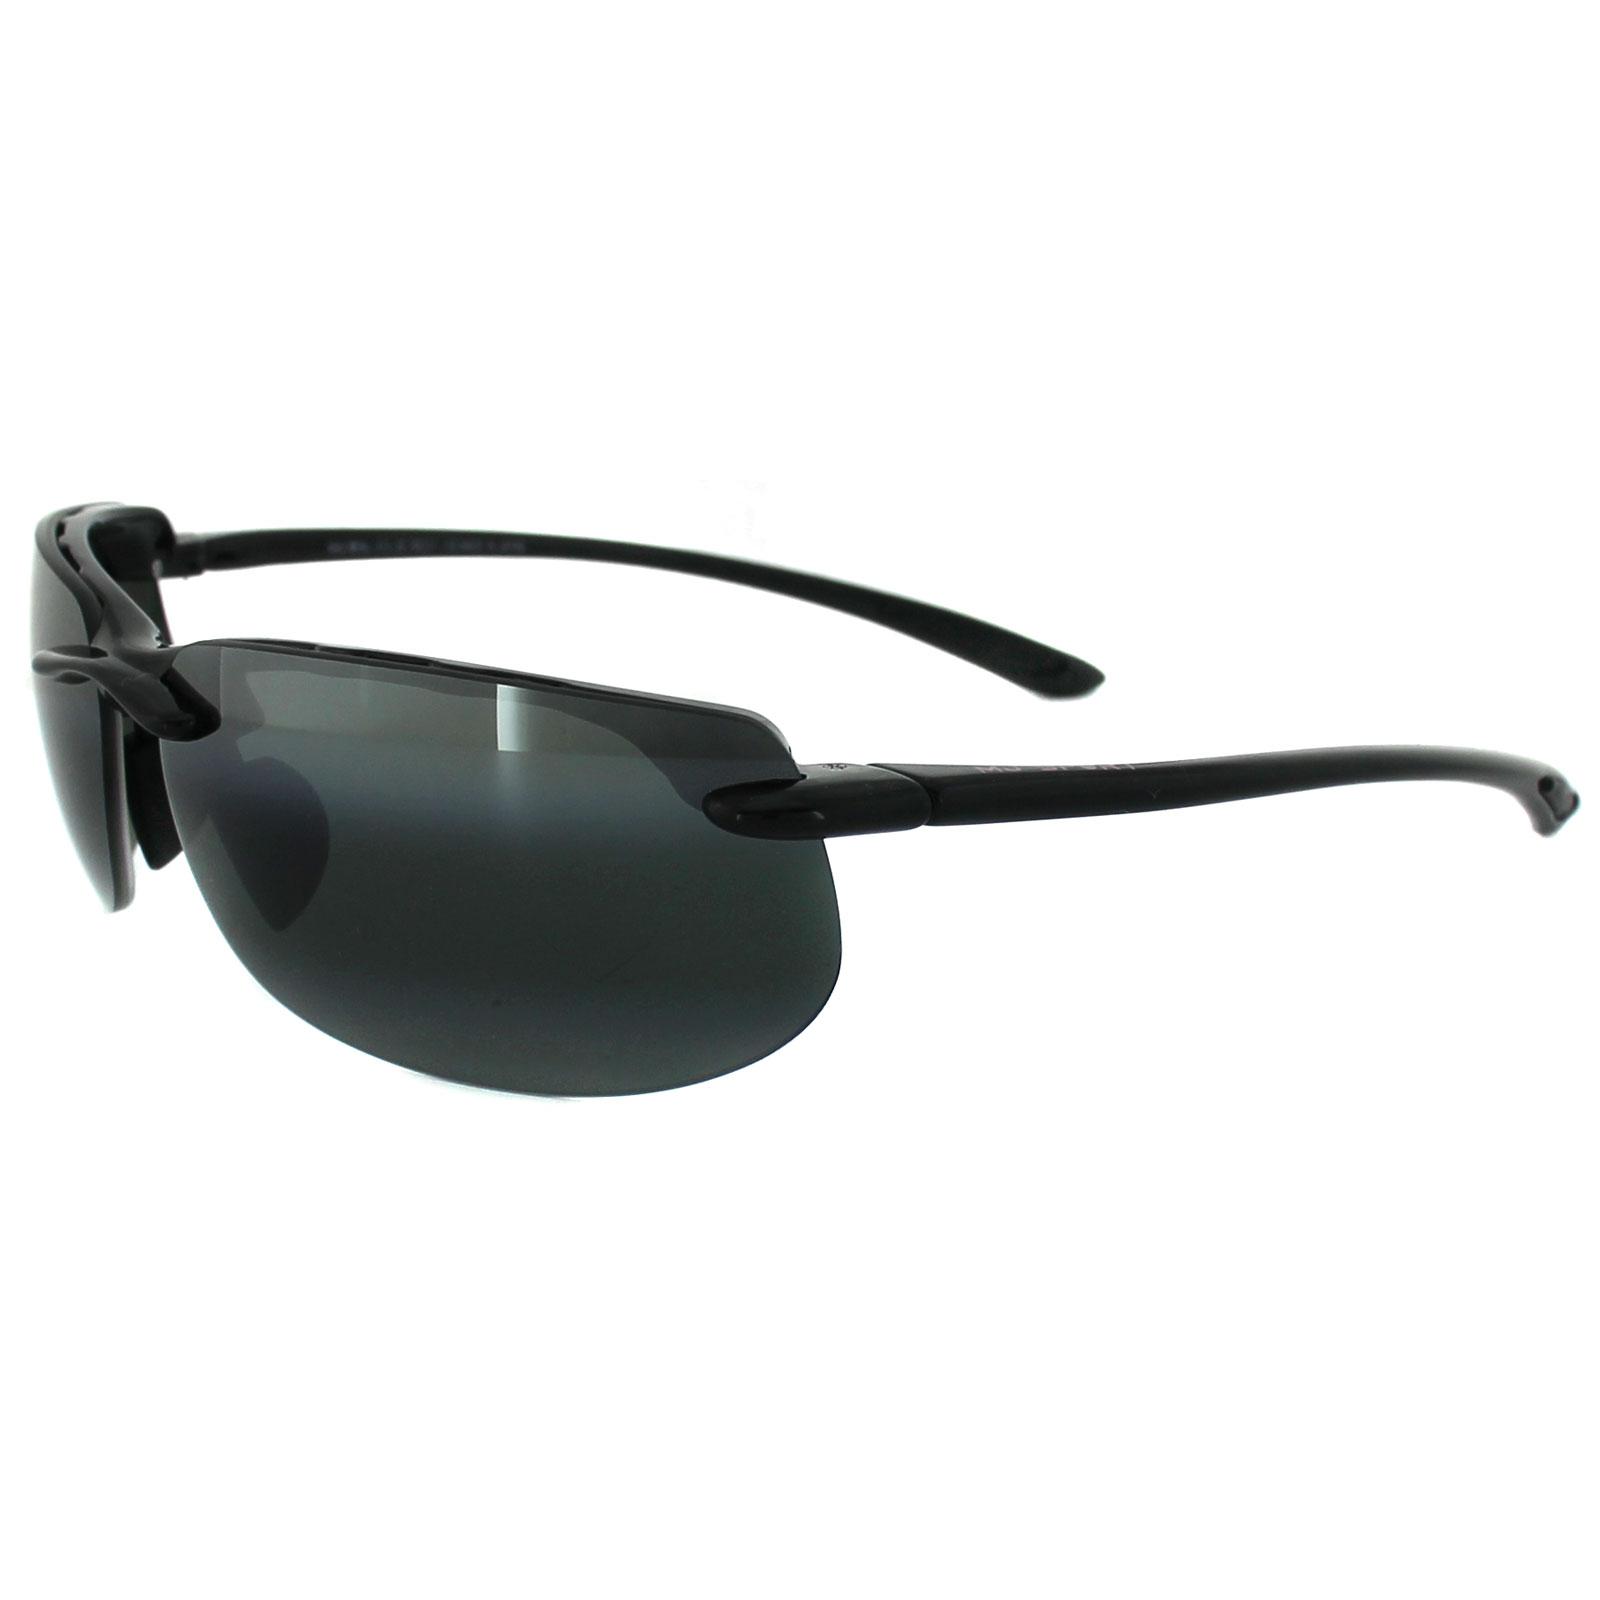 be8fe2ed491bc Sentinel Maui Jim Sunglasses Banyans 412-02 Gloss Black Grey Polarized